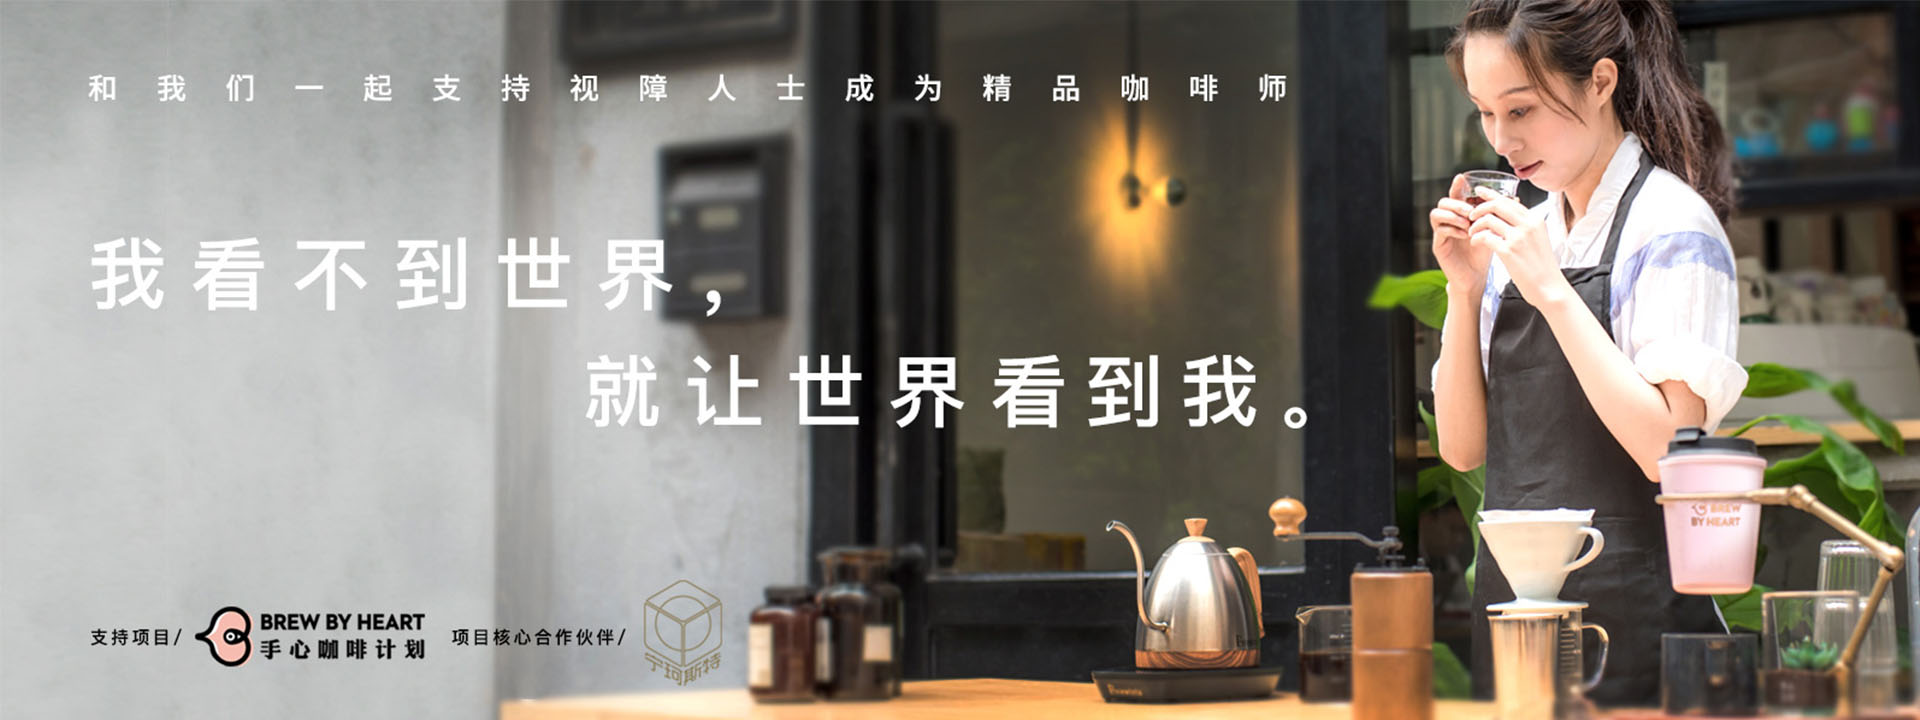 banner3 手心咖啡计划